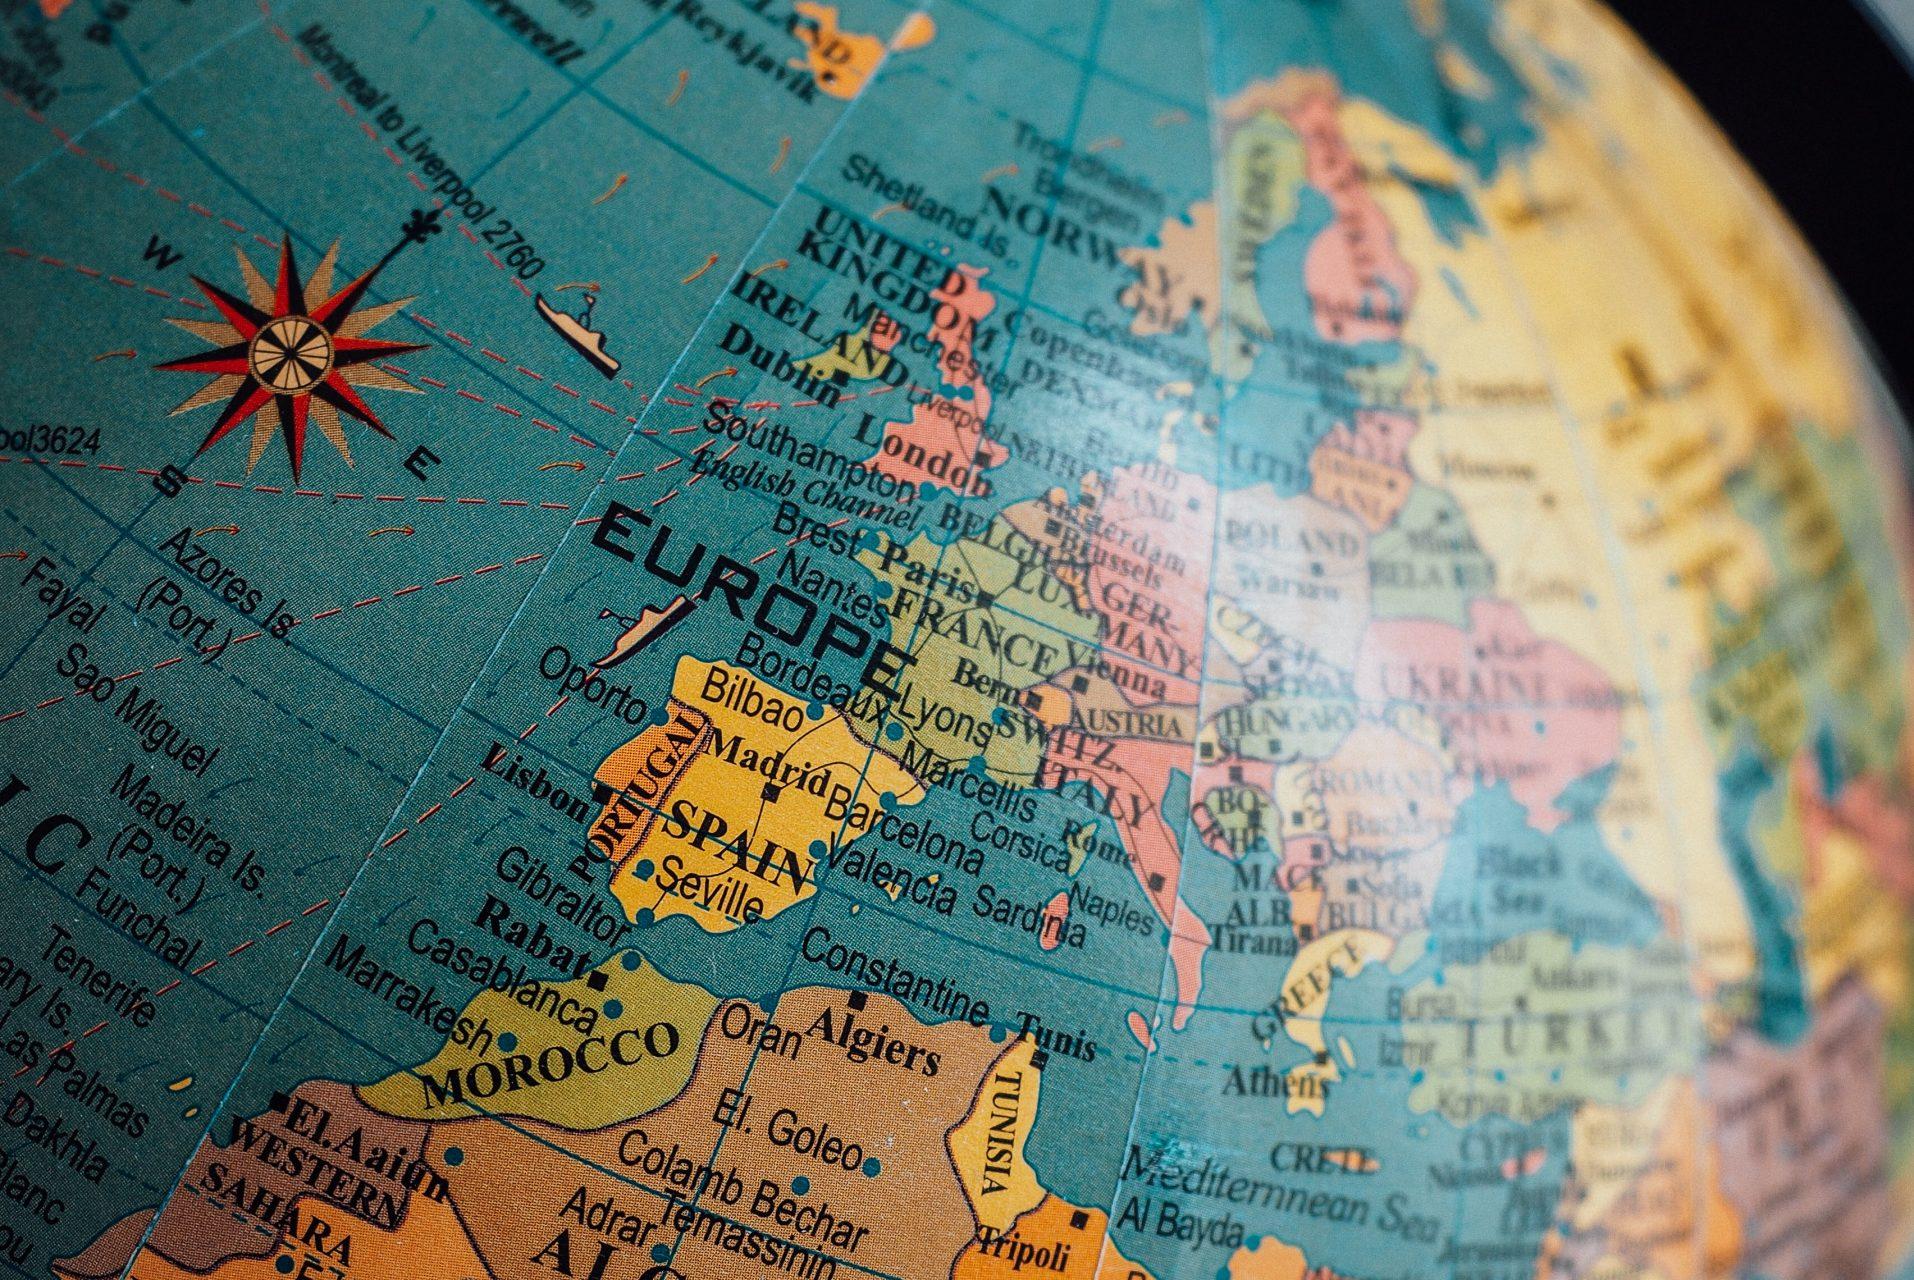 Europe shown on a globe